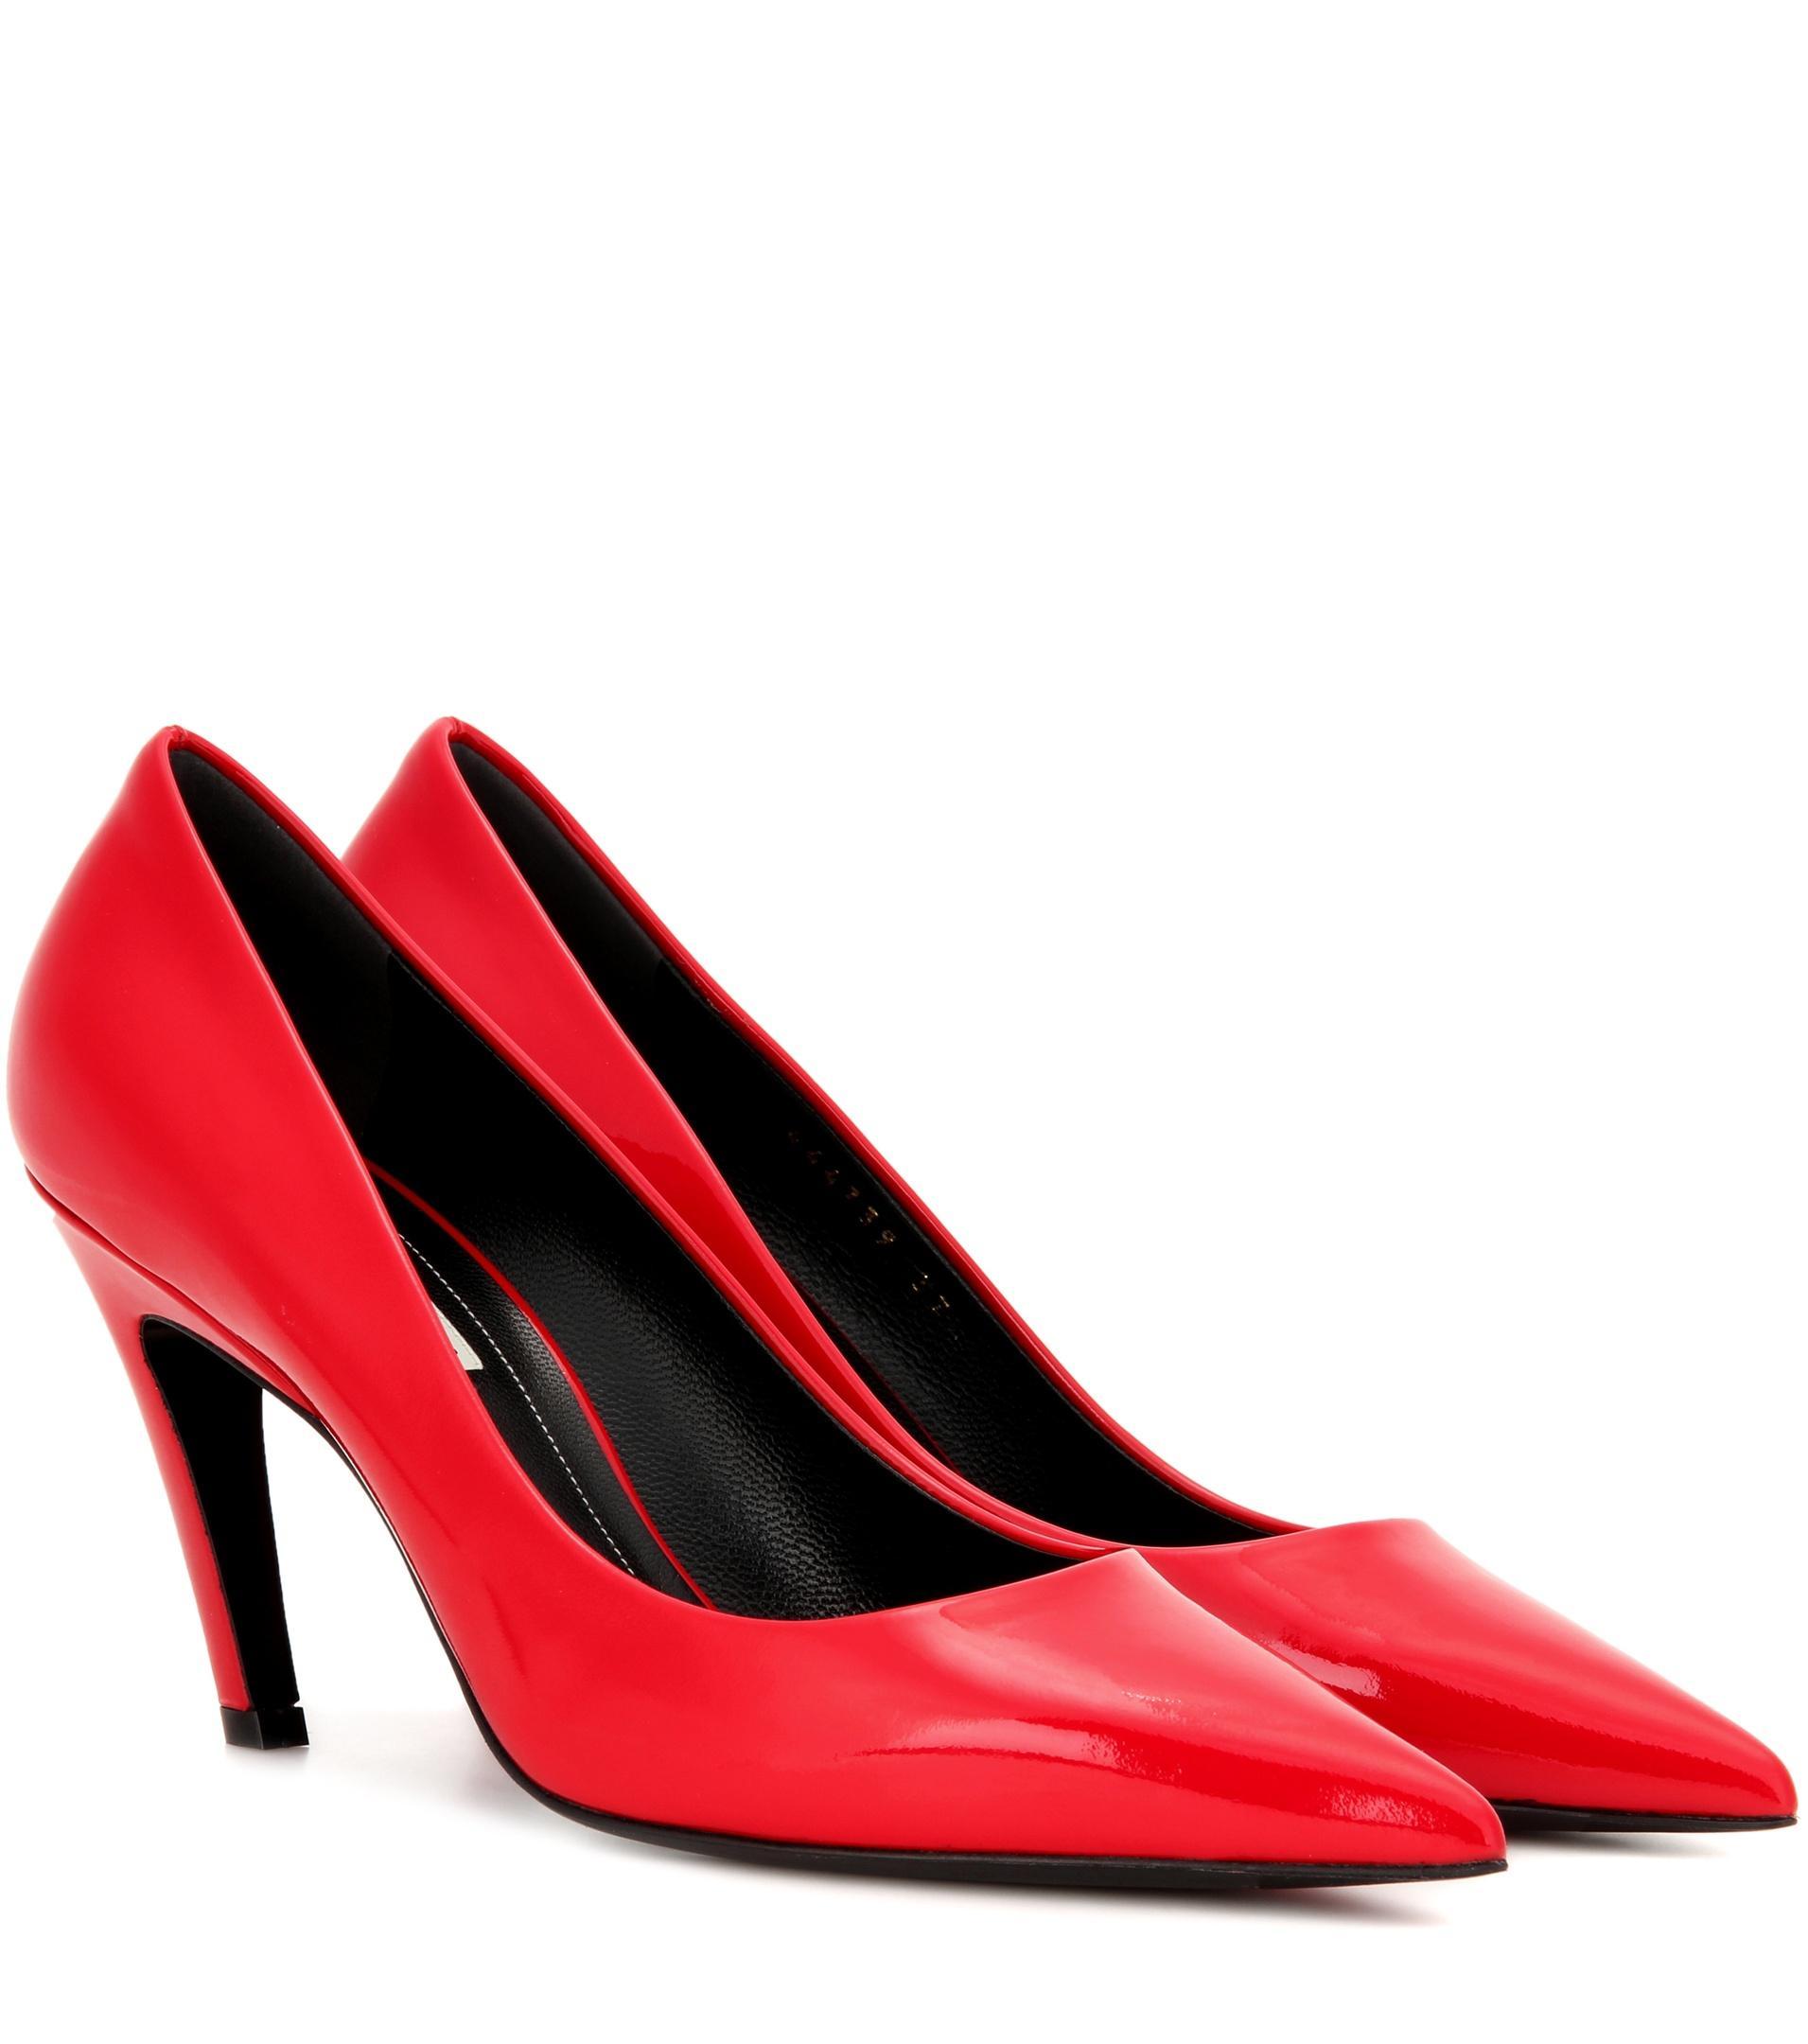 Subjetivo Pensionista Olla de crack  Balenciaga Red Shoes Mcdonald   IUCN Water